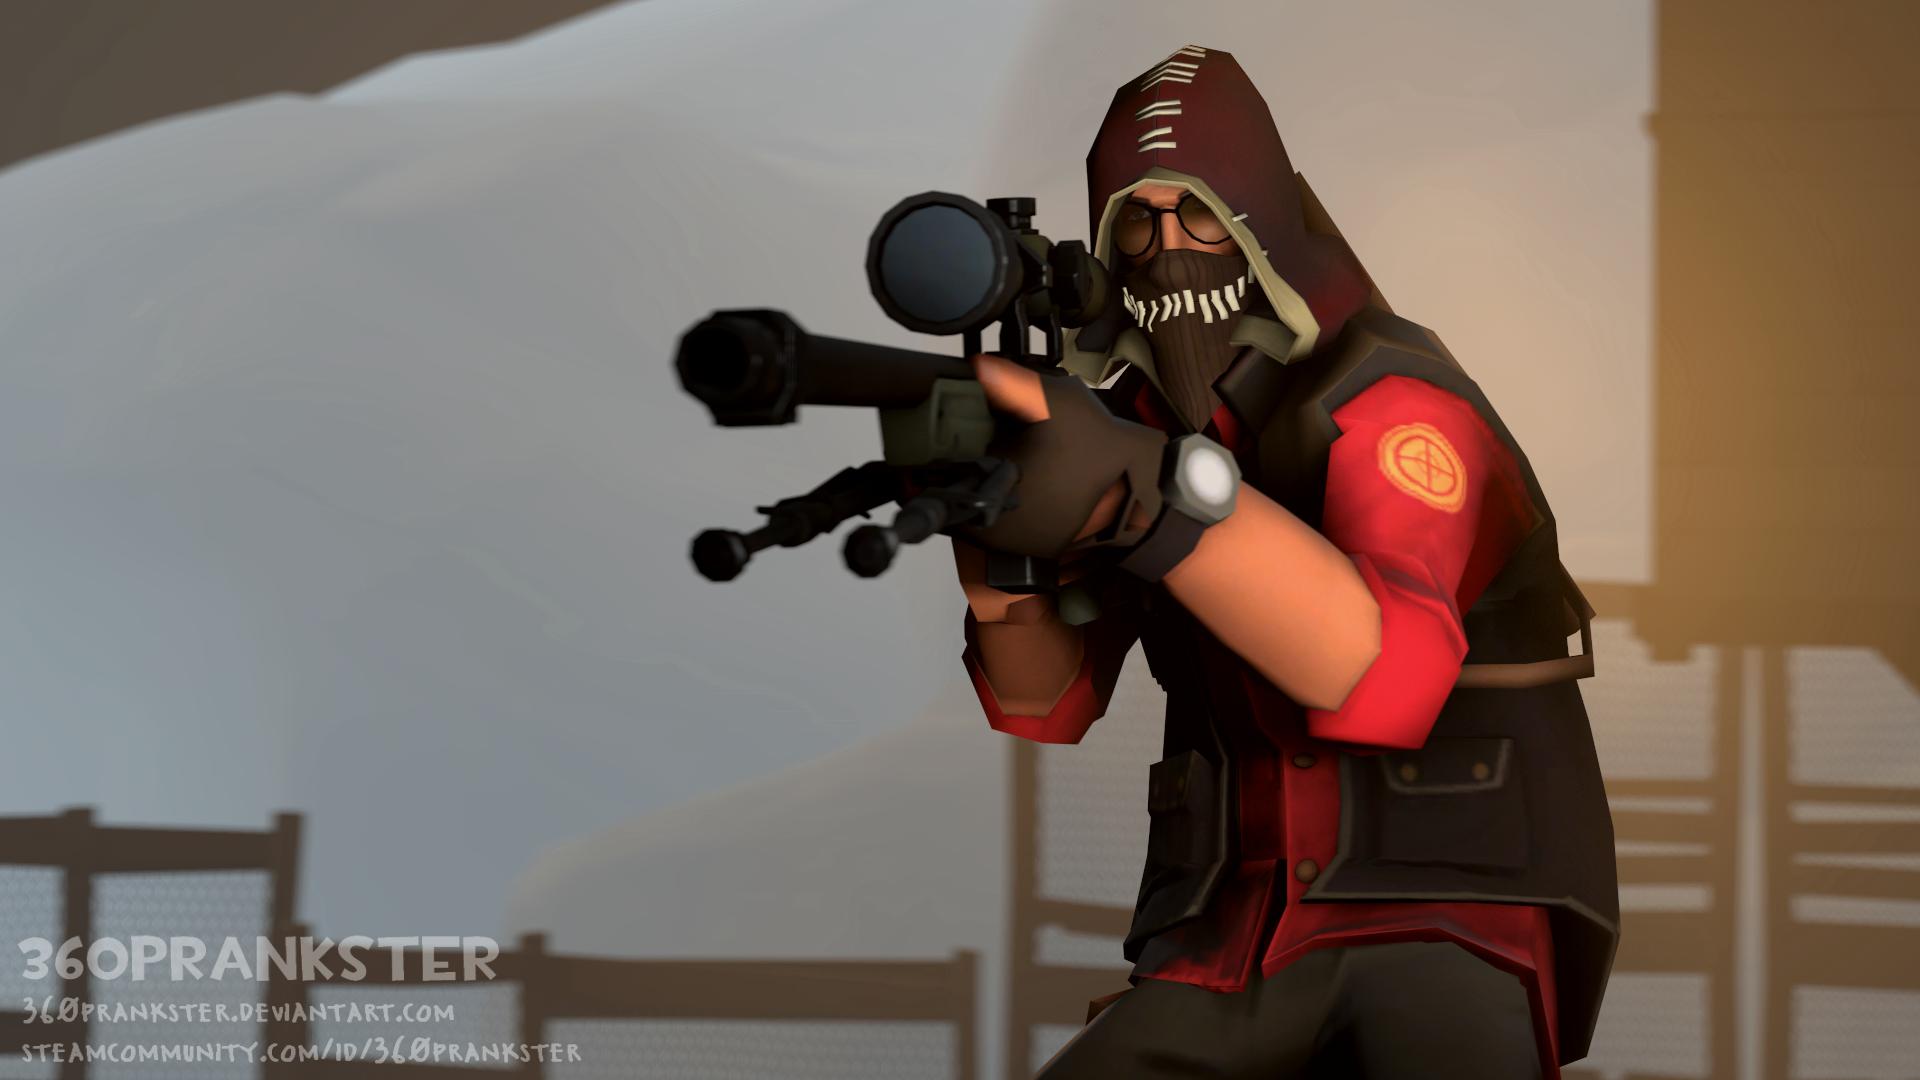 [SFM] TF2 Loadout - Sniper (360PraNKsTer) by 360PraNKsTer ...